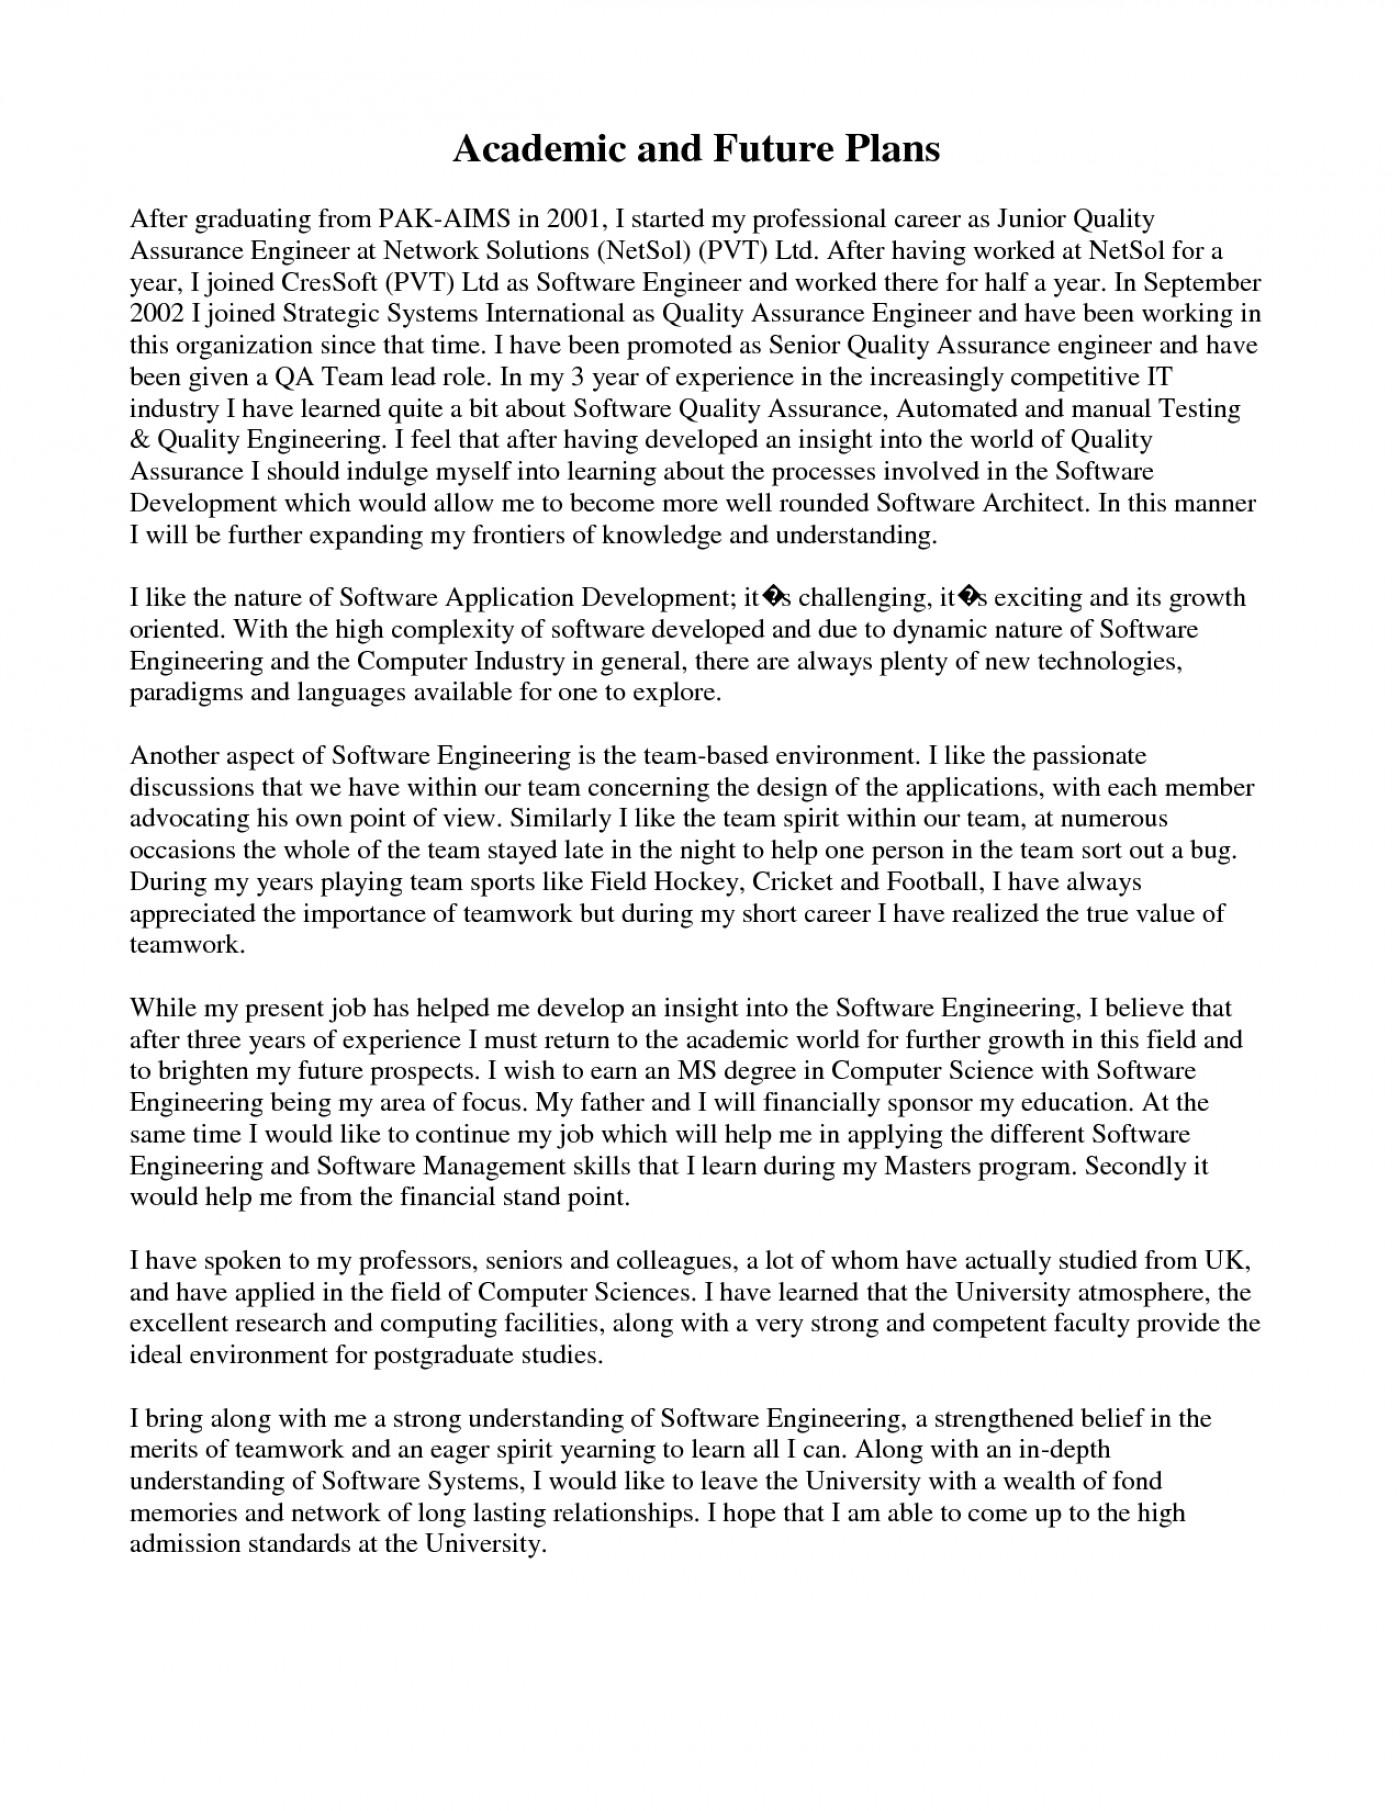 Shoe horn sonata essay - Plagiarism